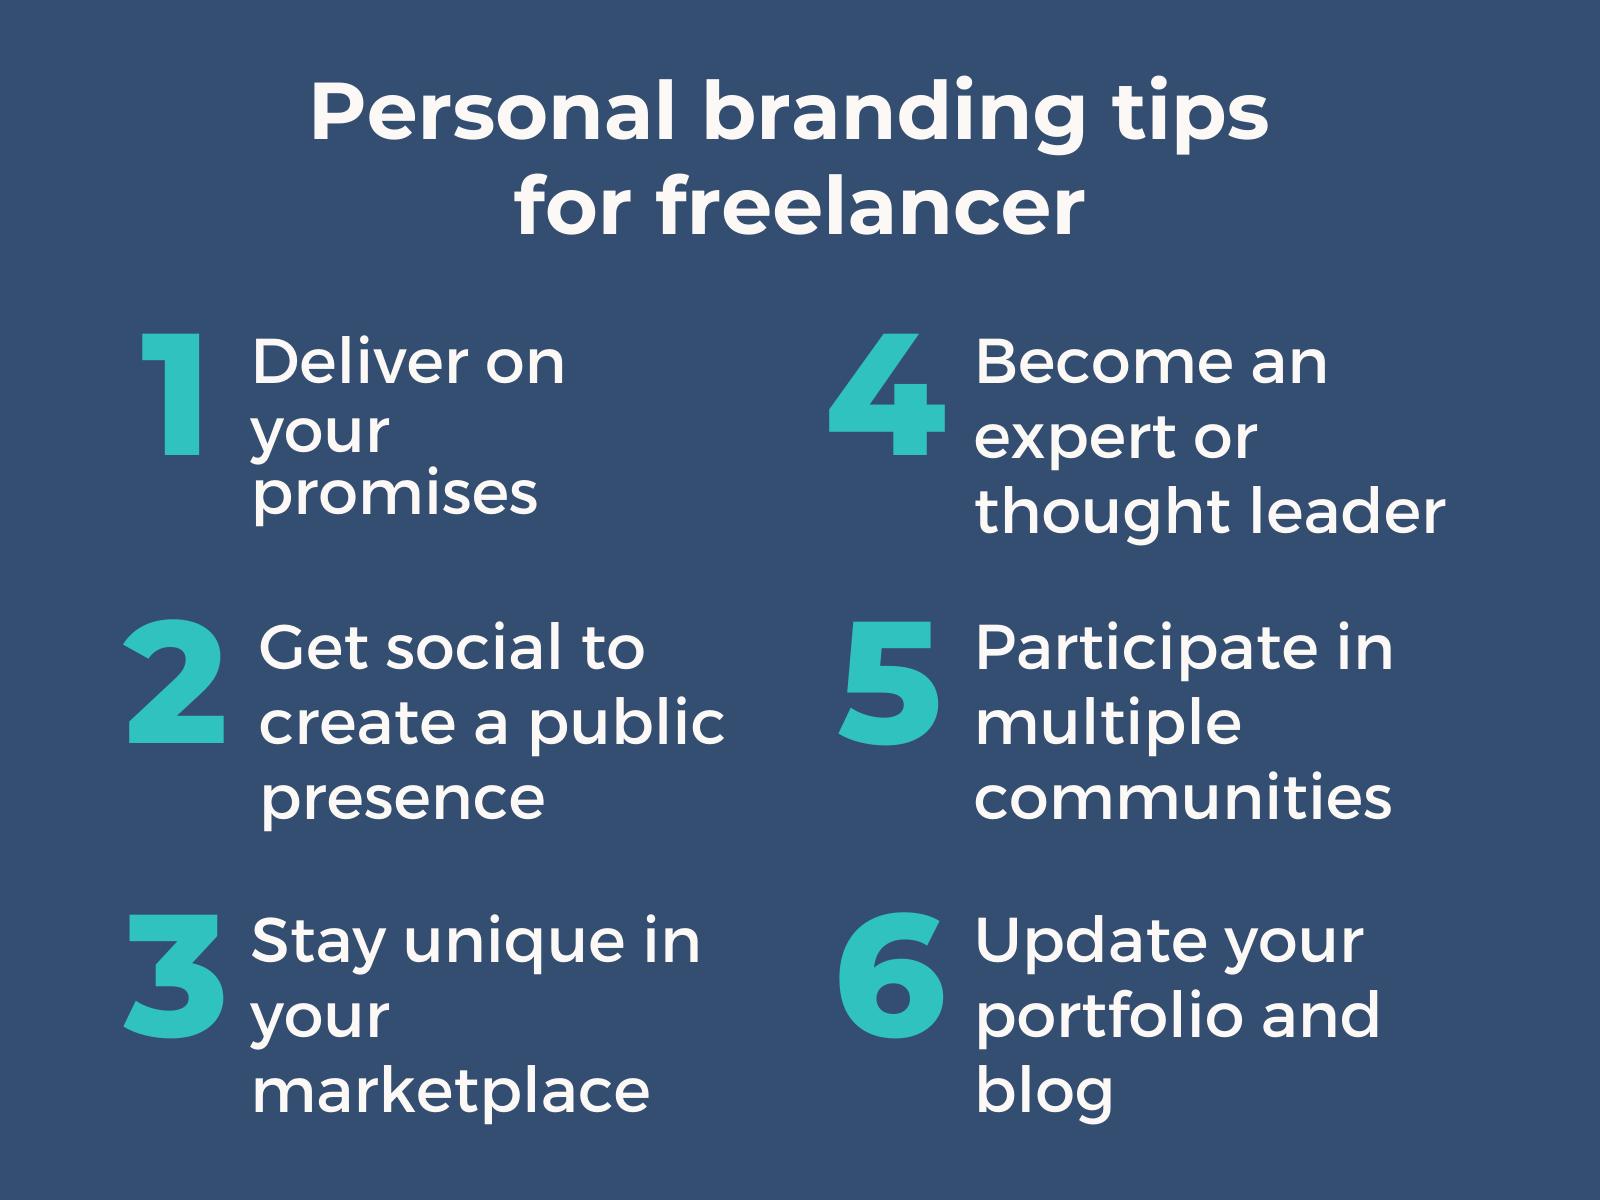 Pesonal brand for freelancer